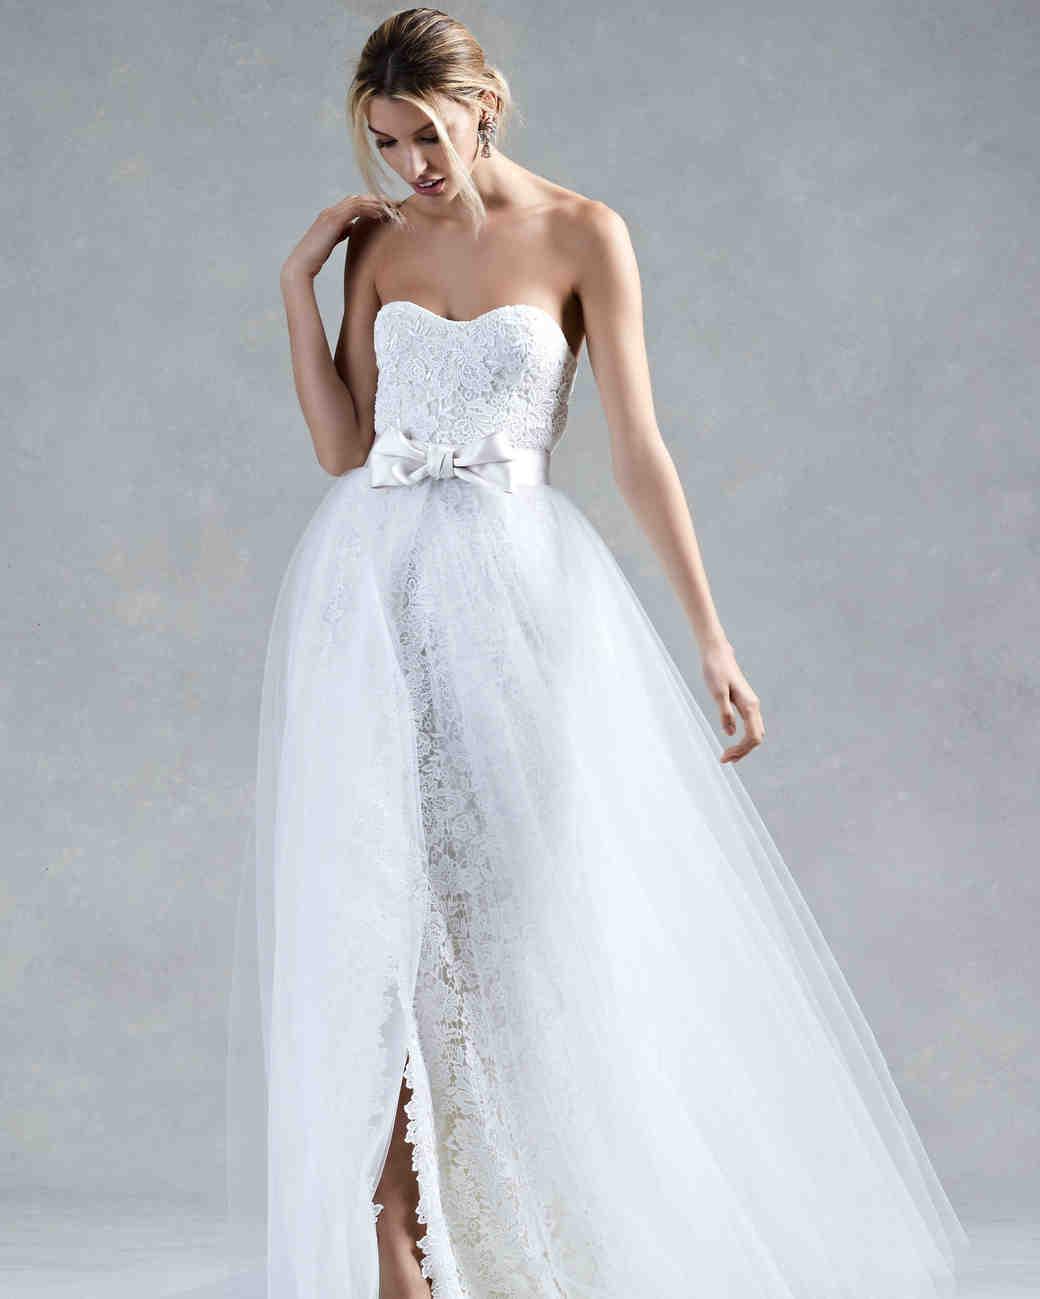 Oscar de la Renta Bow Wedding Dress